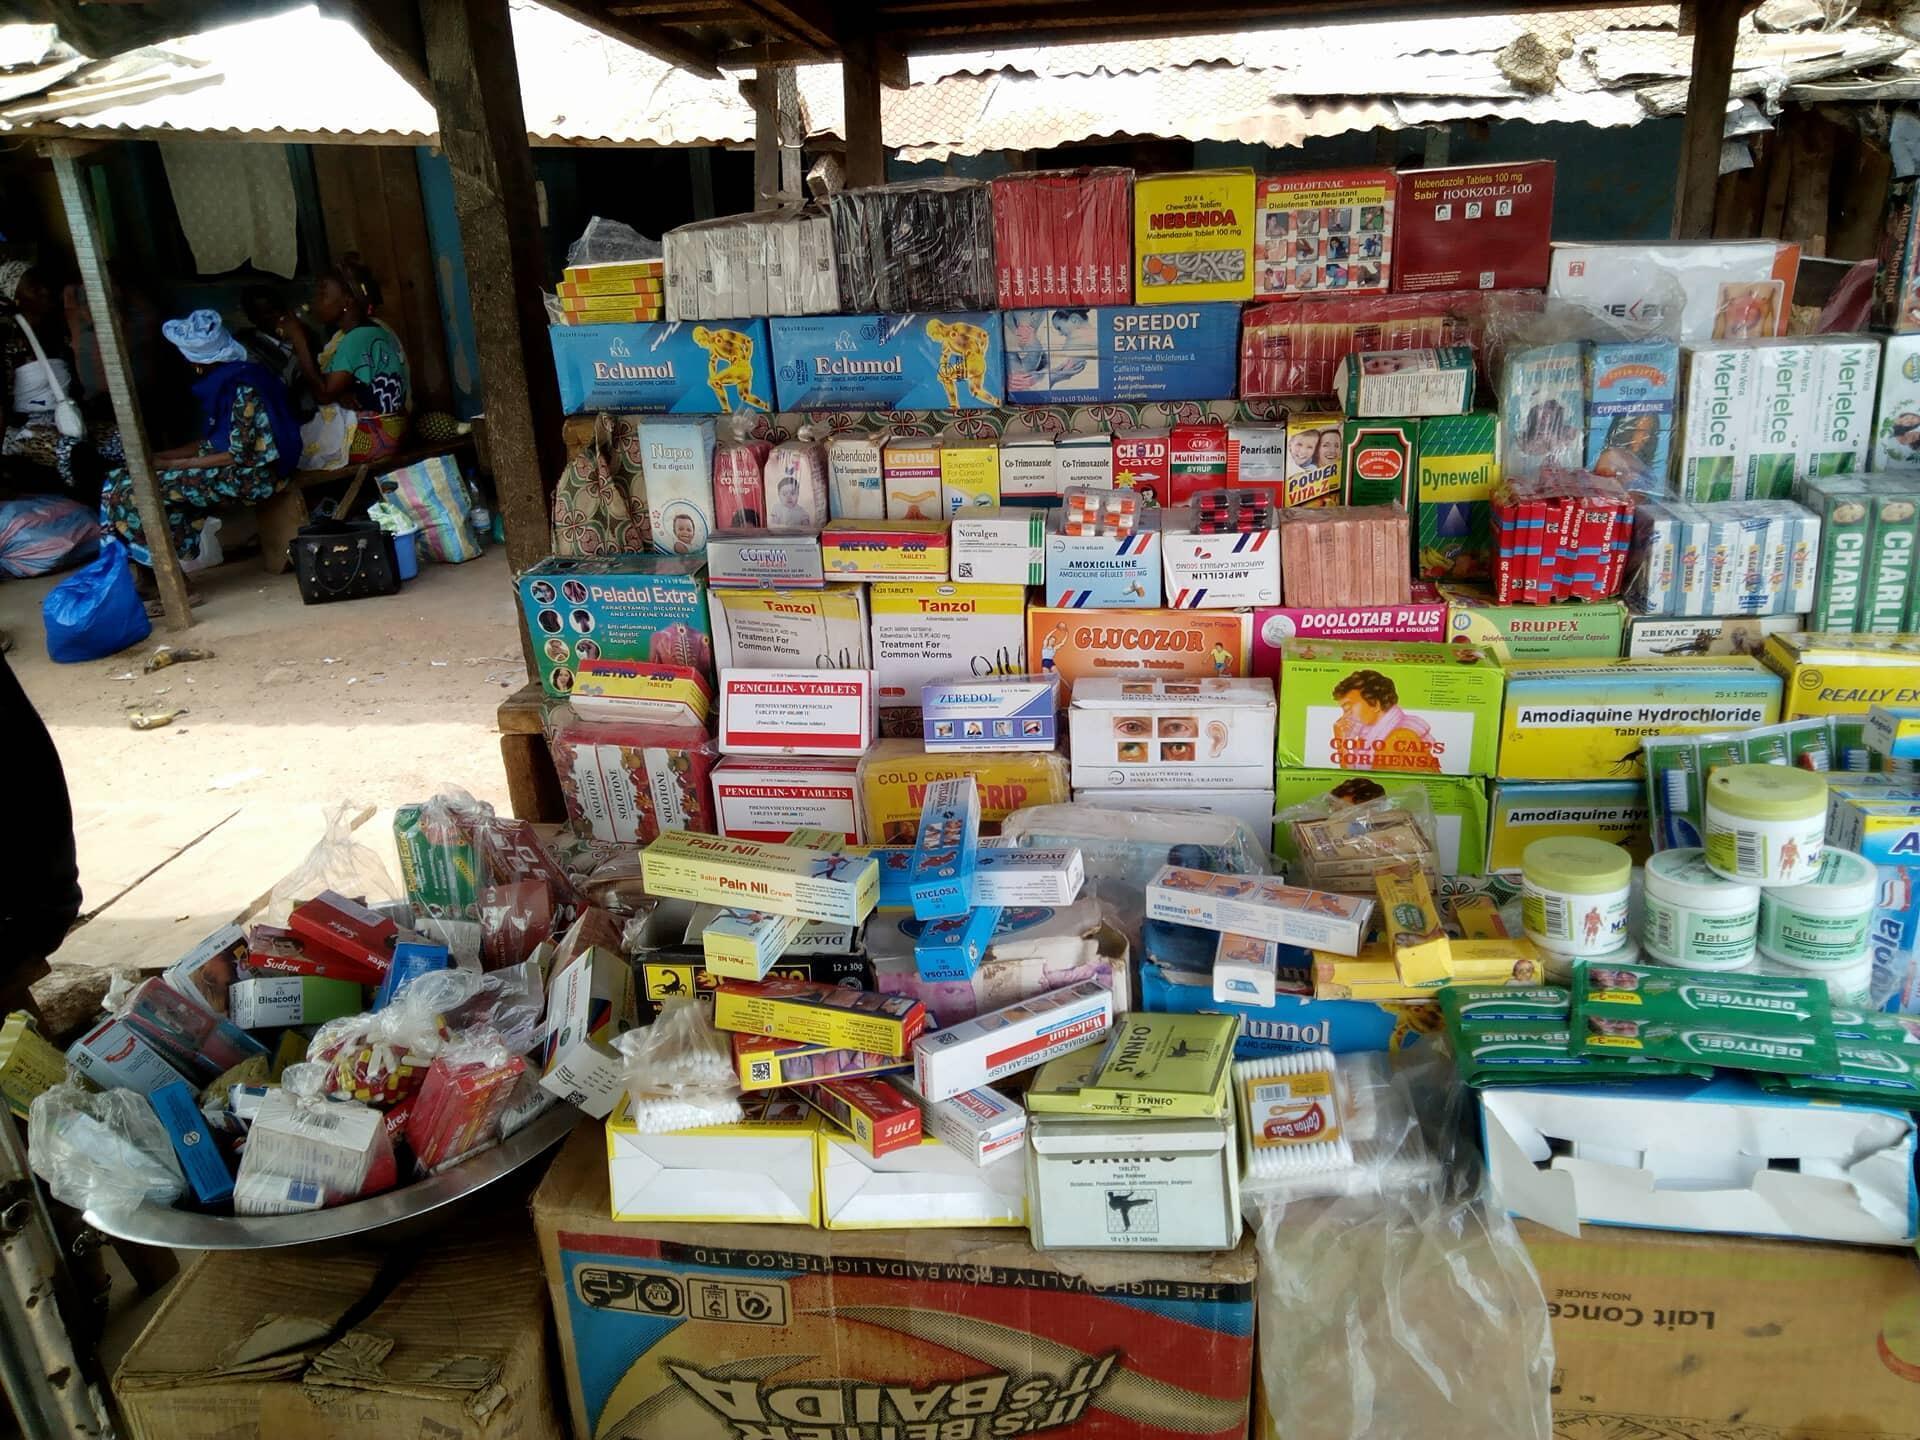 Un étalage de médicaments dans la gare routière de Mahapleu. Crédit : Rita Dro.